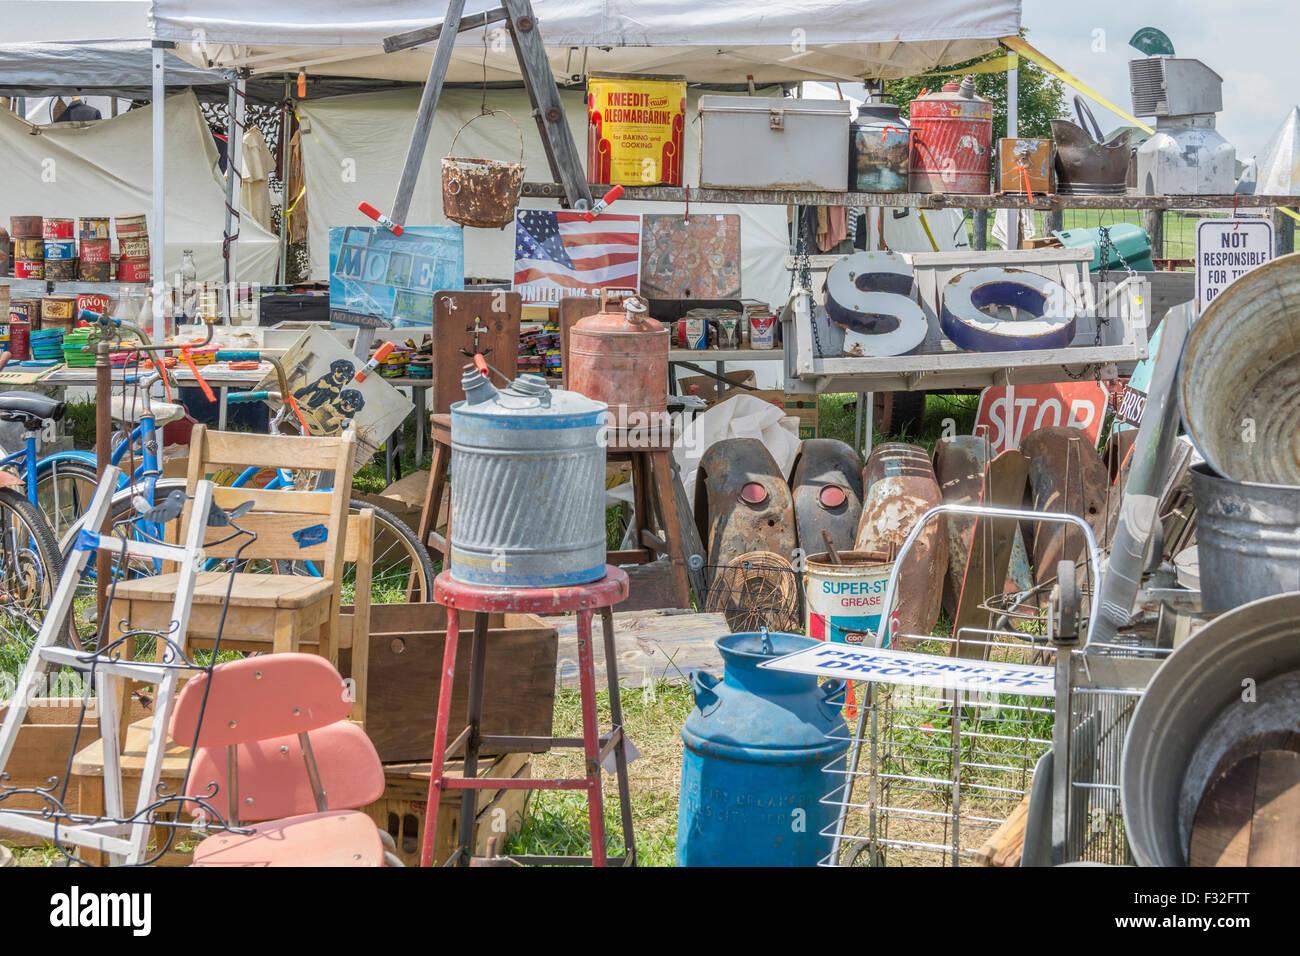 Highway 127 Yard Sale in Kentucky USA Stock Photo: 87952168